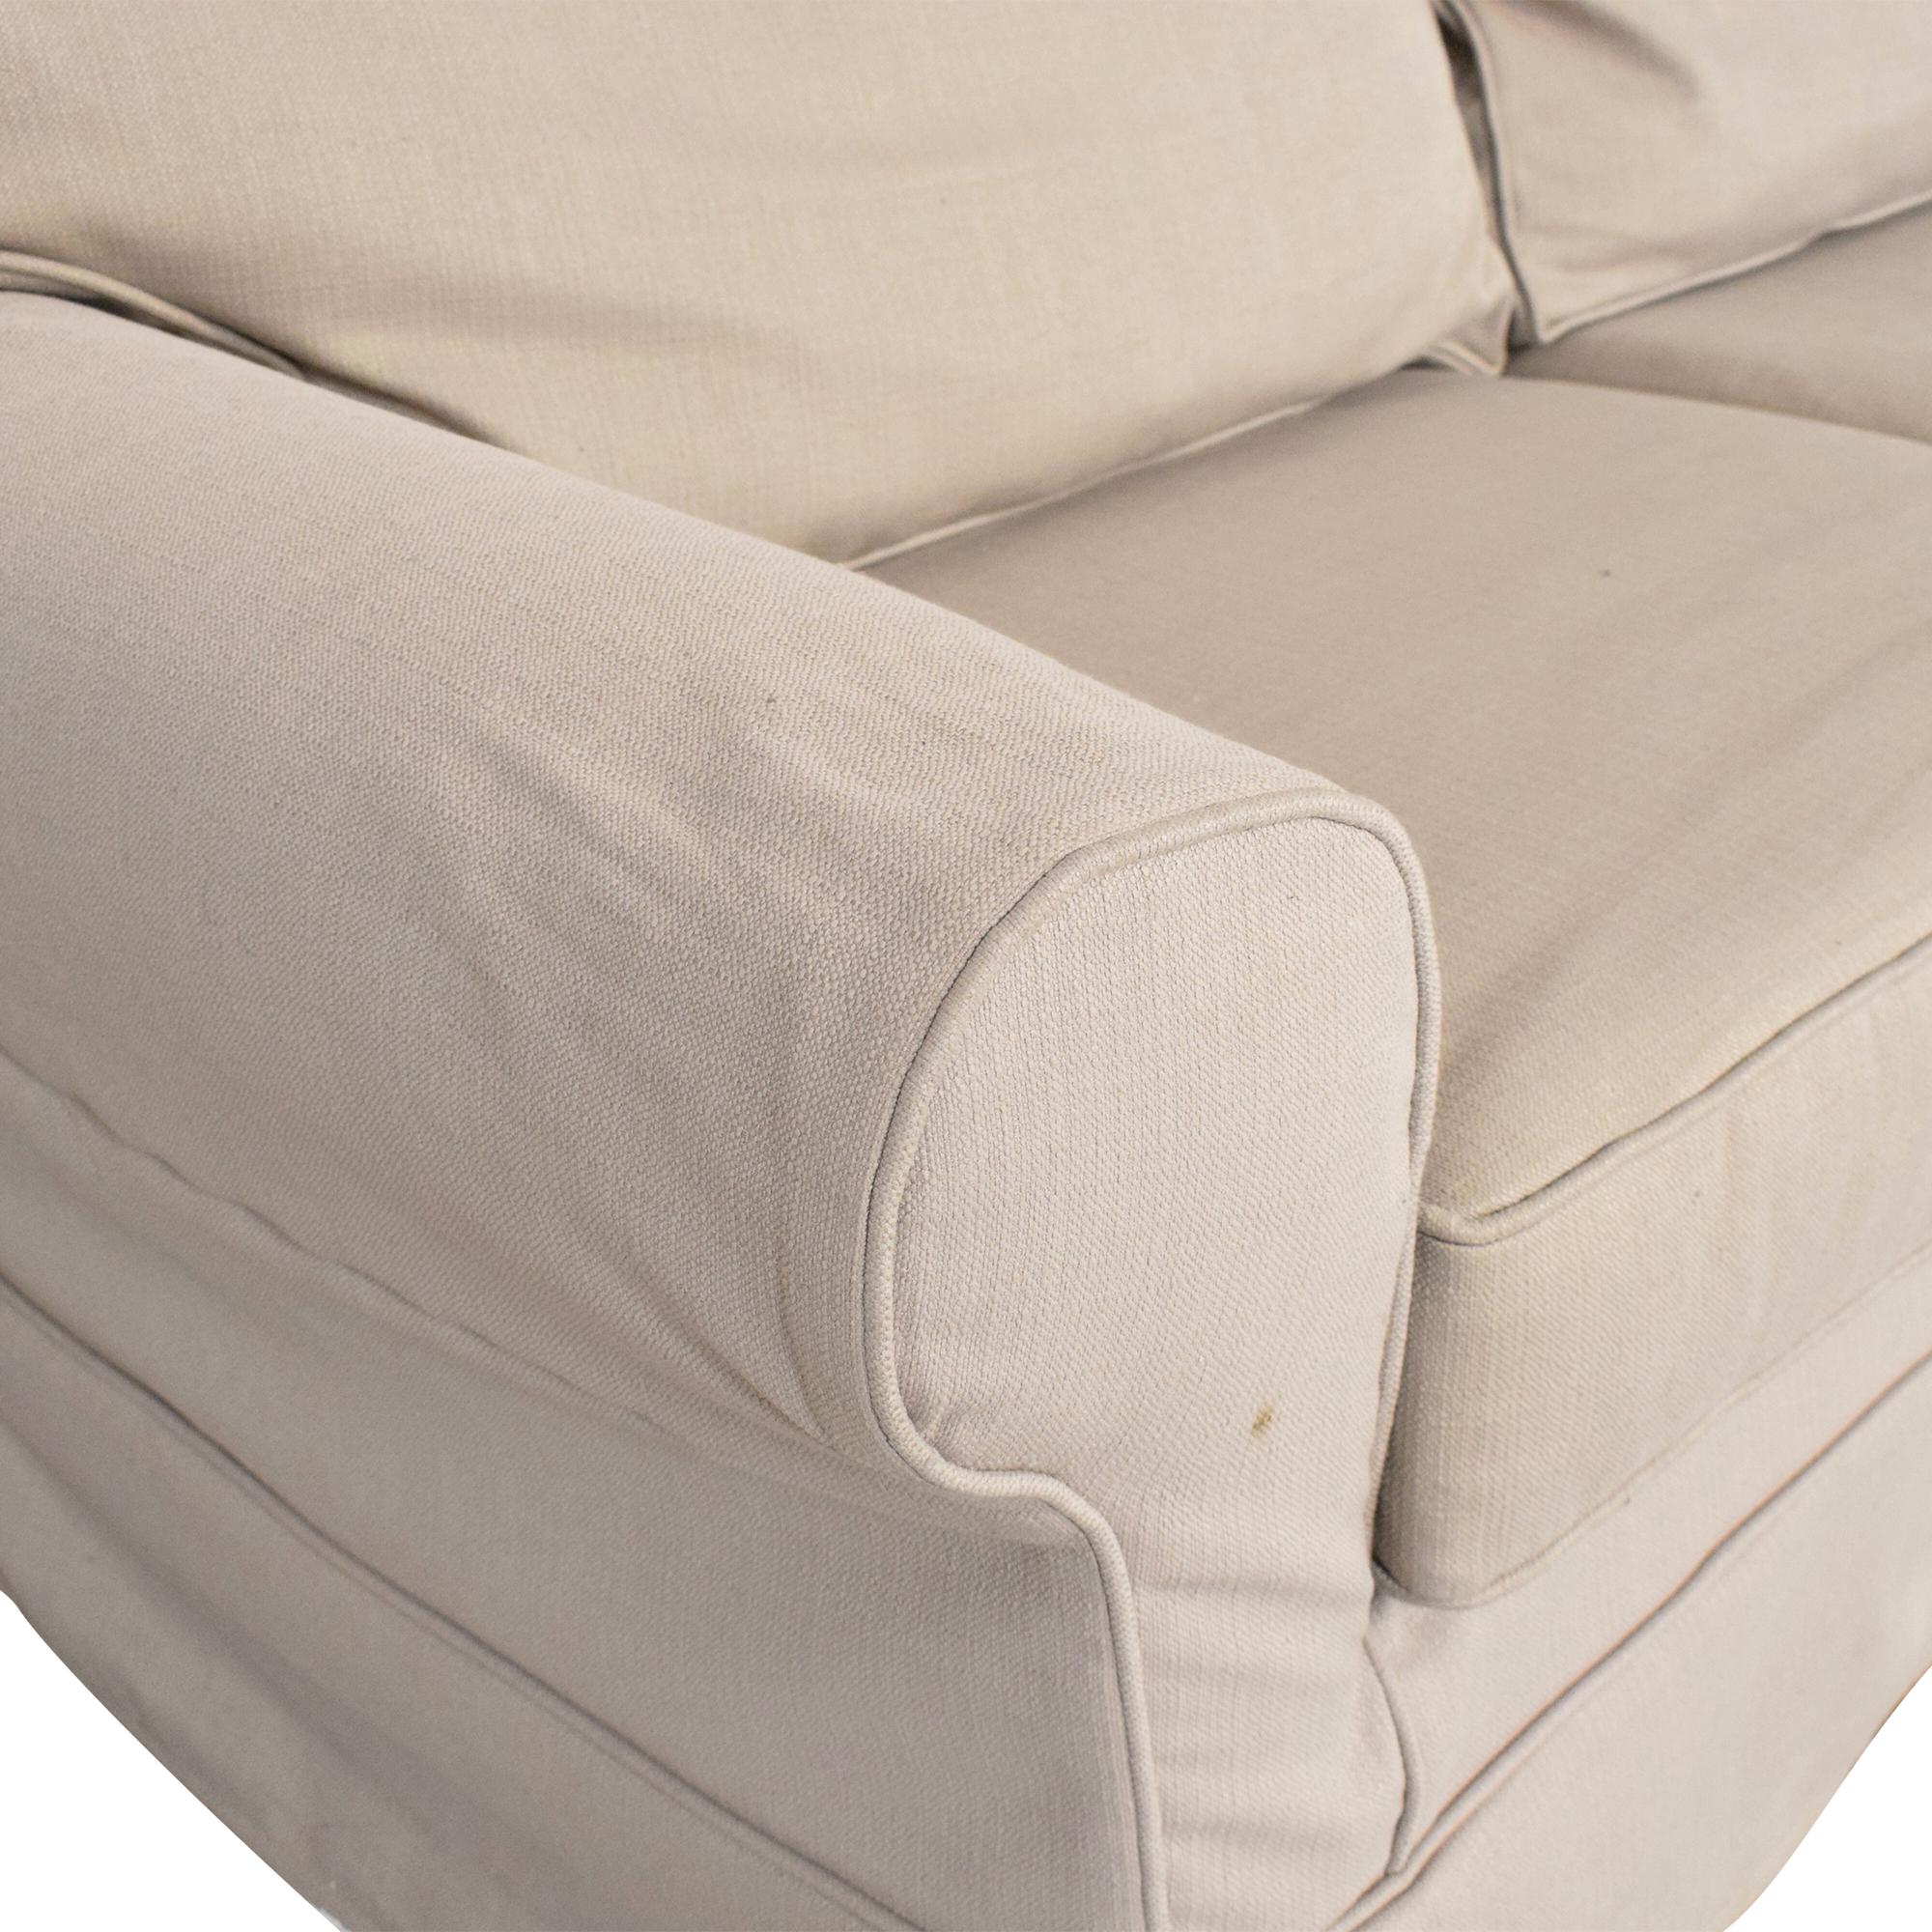 Mitchell Gold + Bob Williams Mitchell Gold + Bob Williams Slipcover Sofa nude